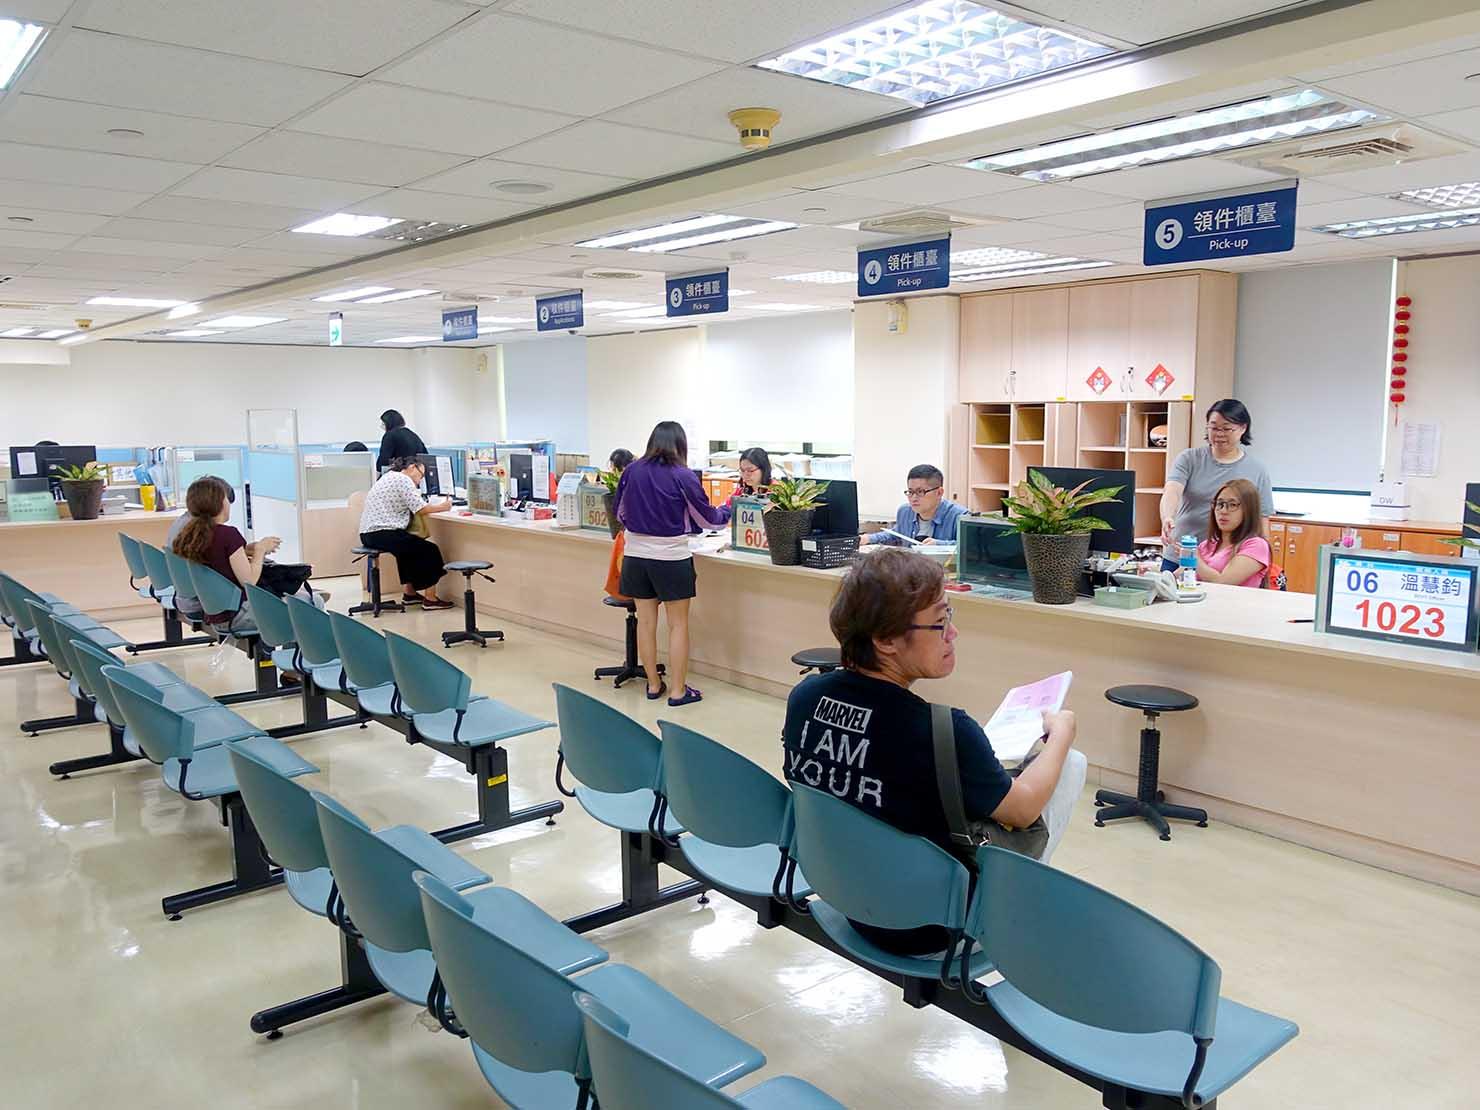 「外國人工作許可證(永久工作證)」の申請場所・勞動部勞動力發展署のオフィス内